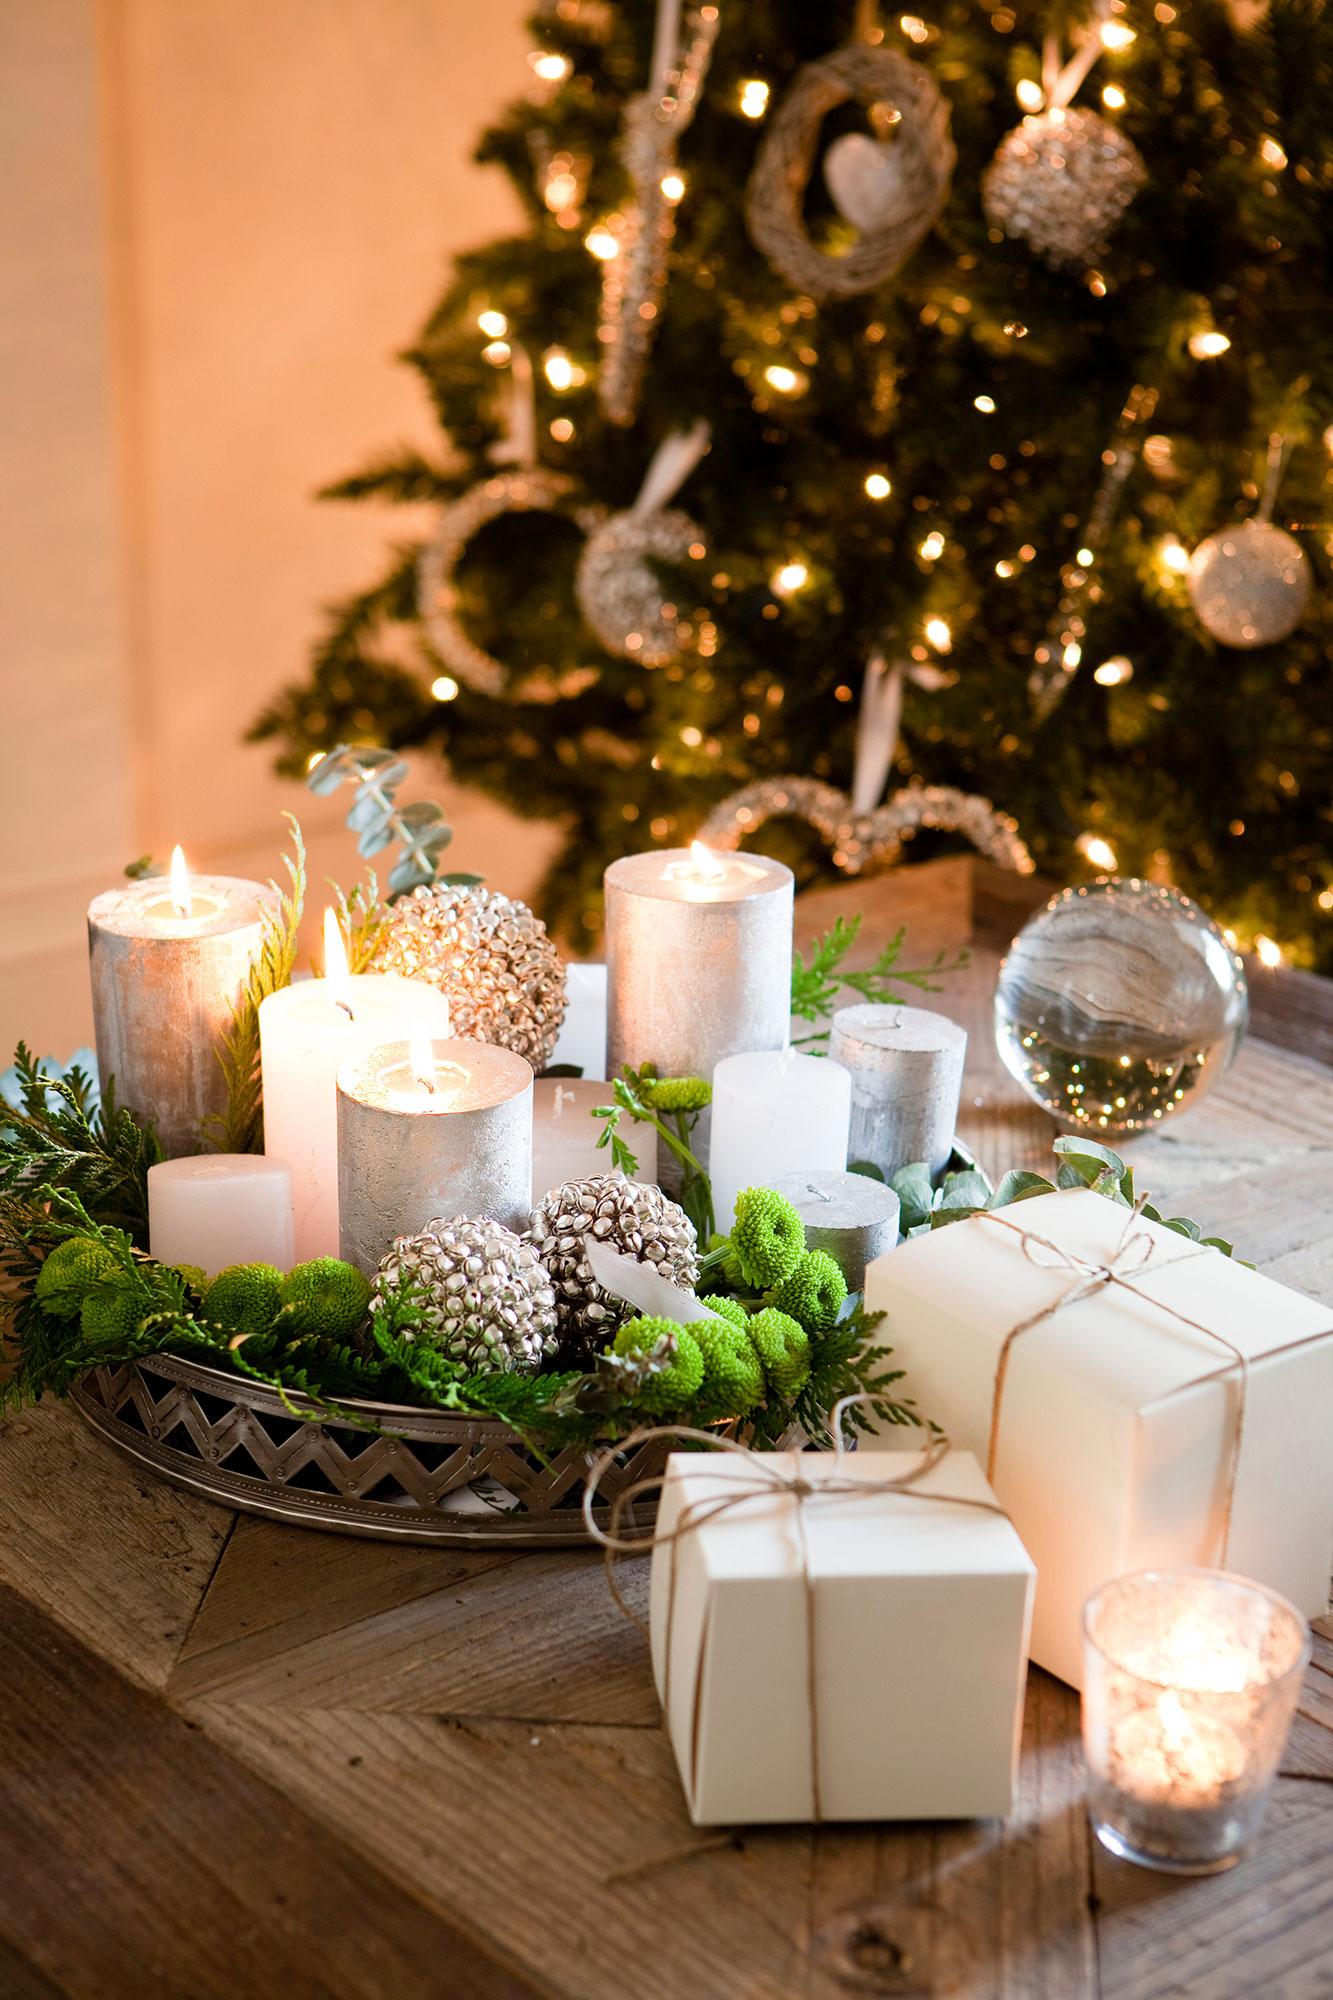 Detalles e ideas en plata para decorar tu casa esta navidad for Adornos originales para decorar casa